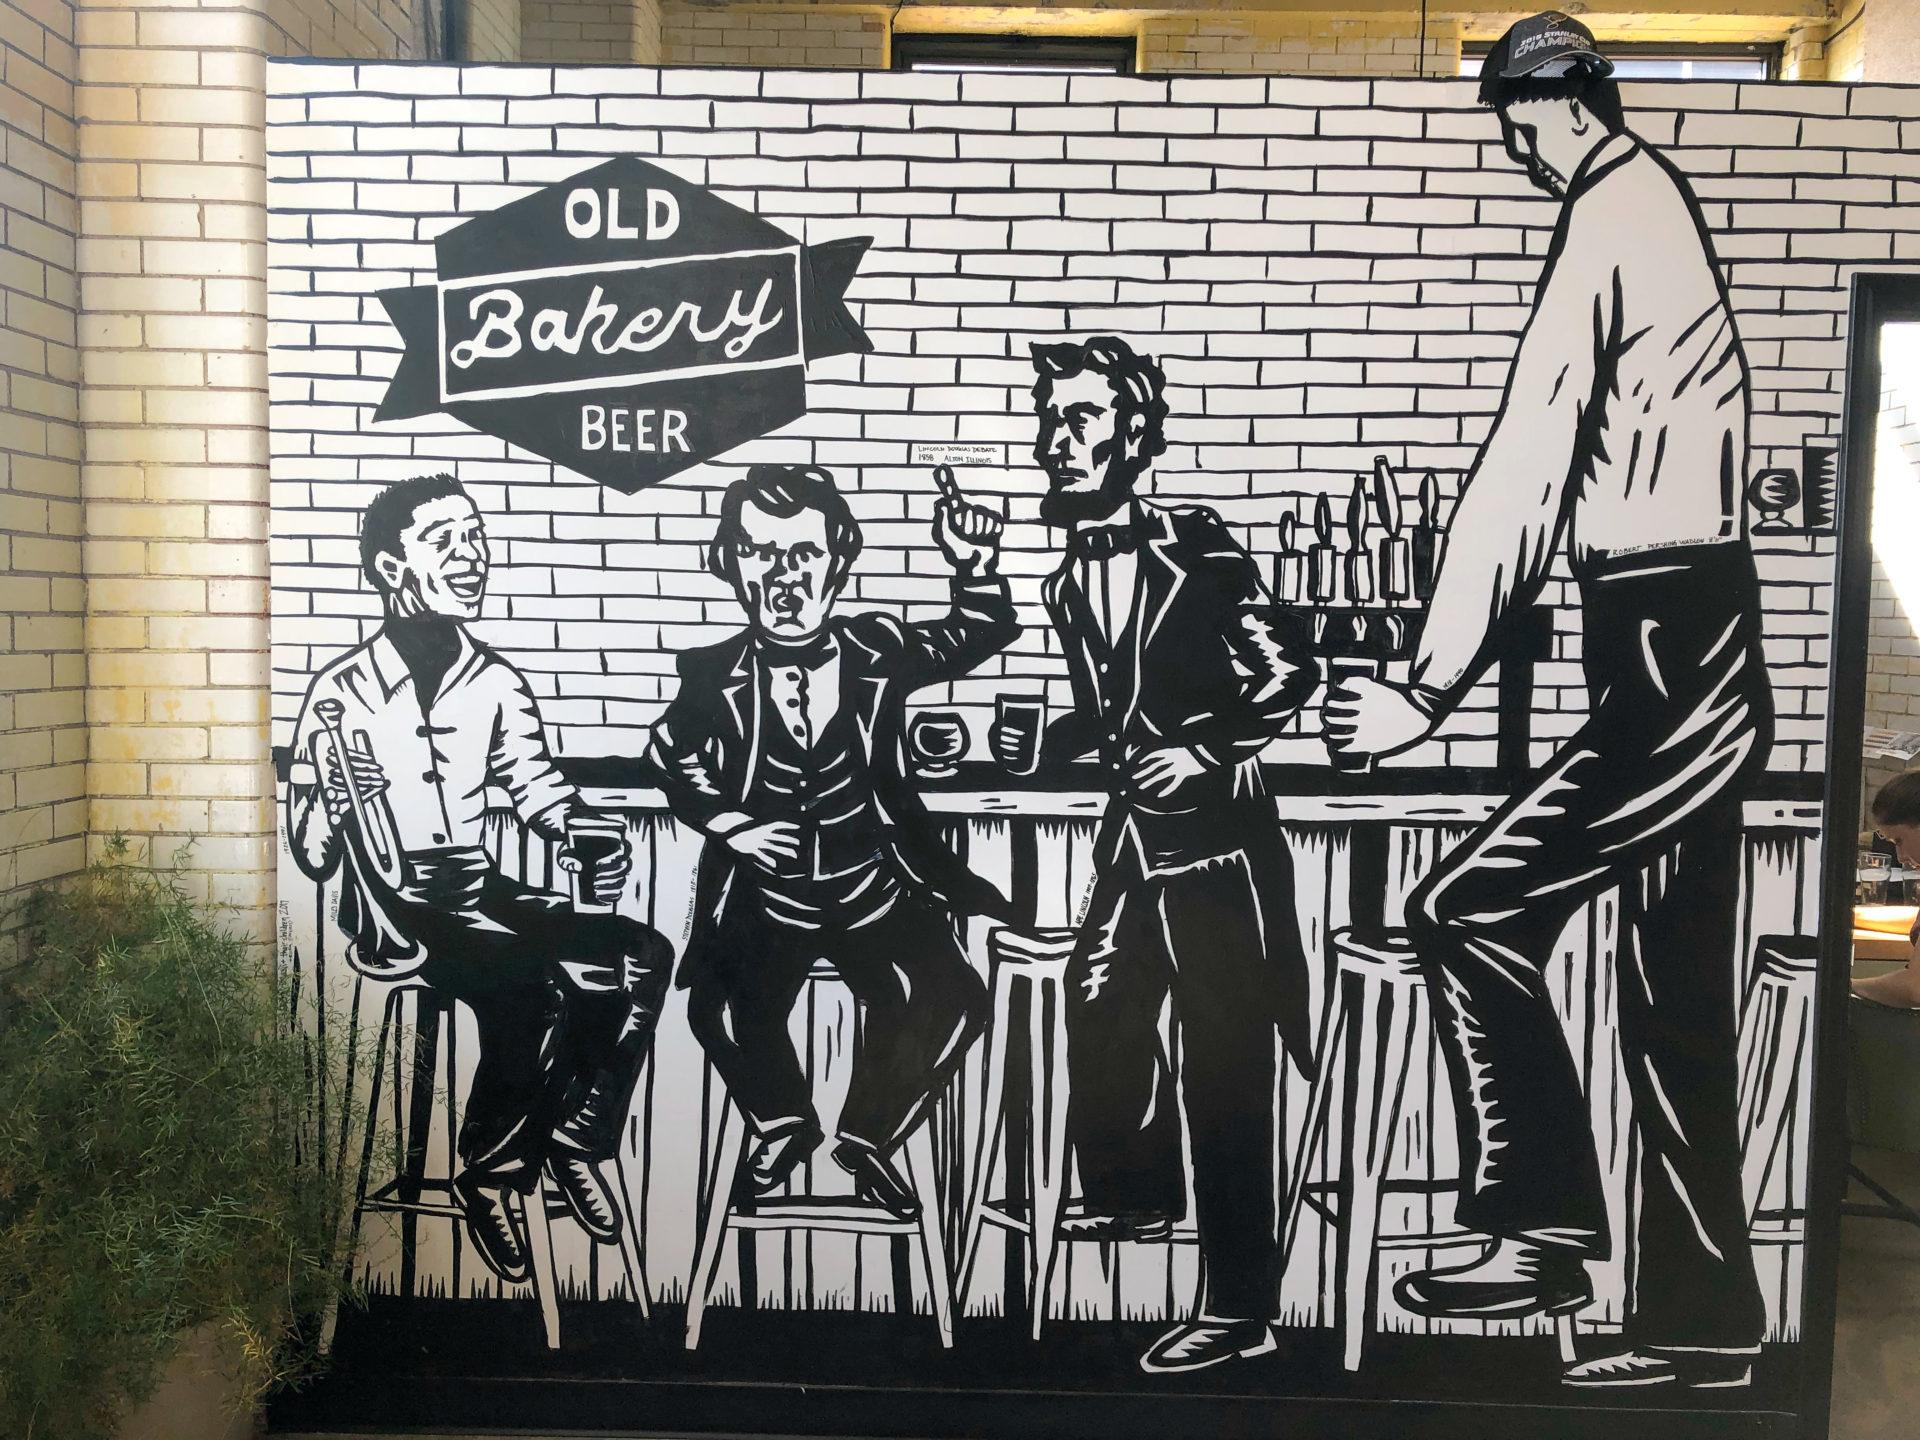 Wandgemälde der Old Bakey Beer Factory in Alton an der Route 66 in Illinois